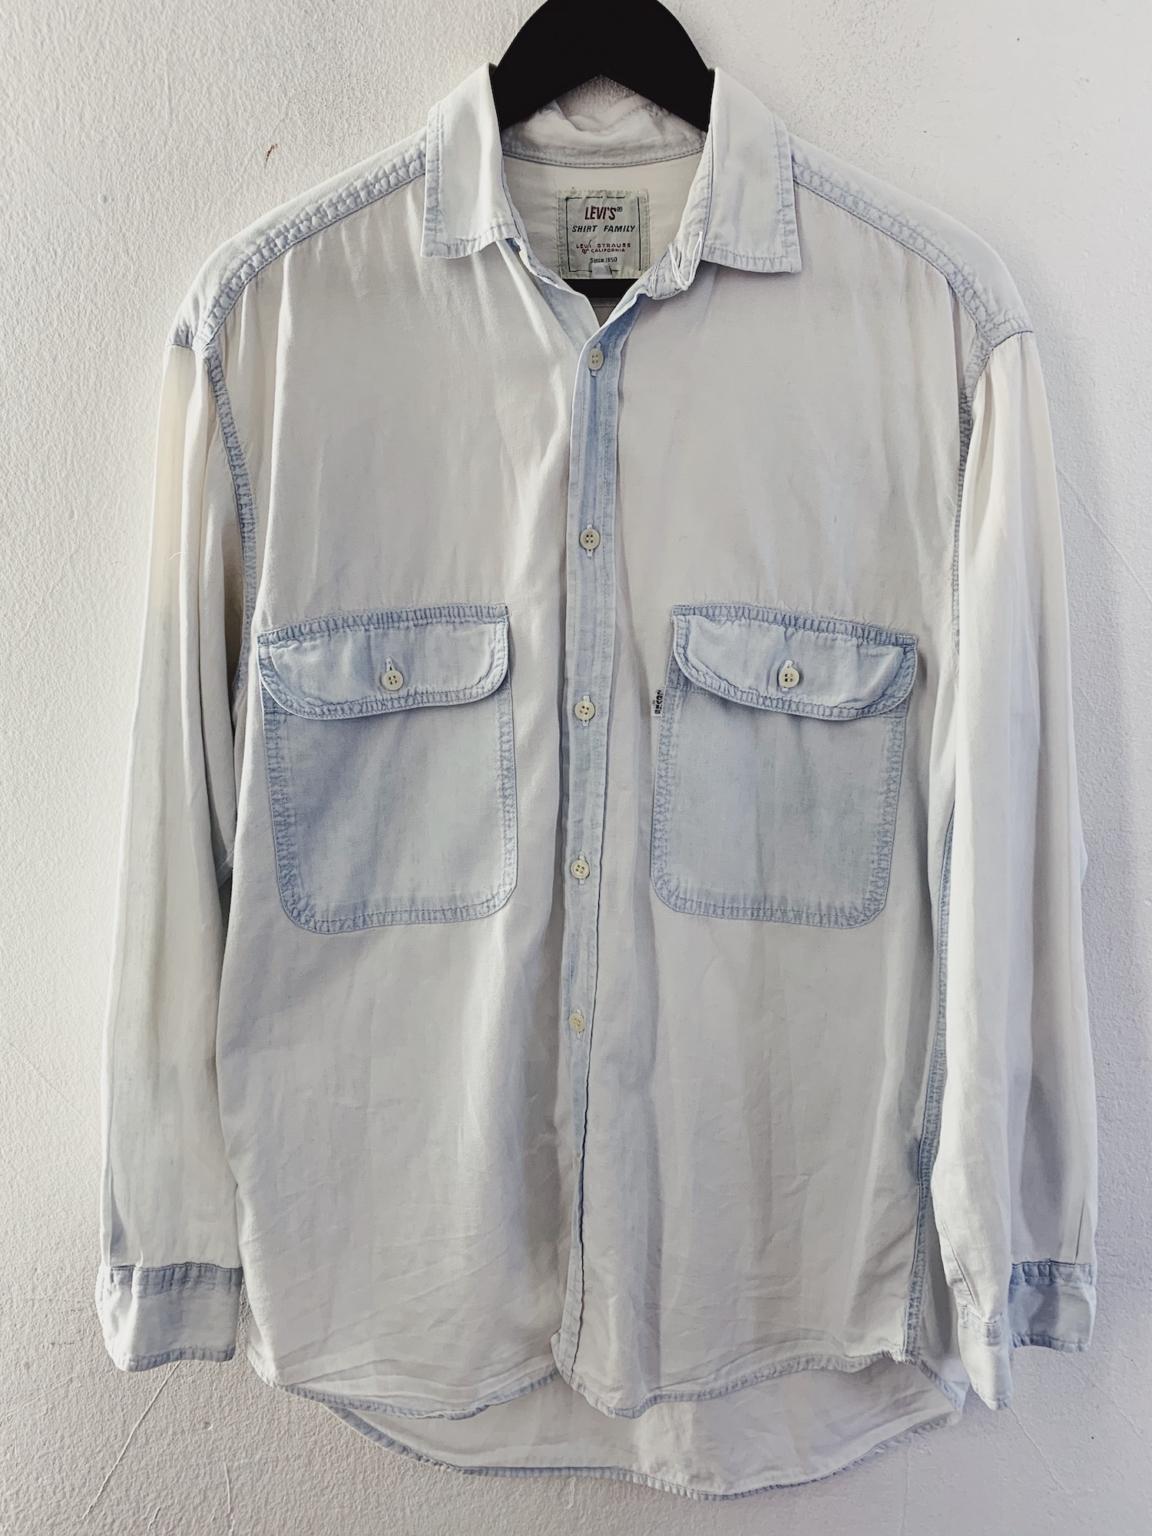 Ecosphere Vintage - Levi's Oversized Light Shade Denim Shirt